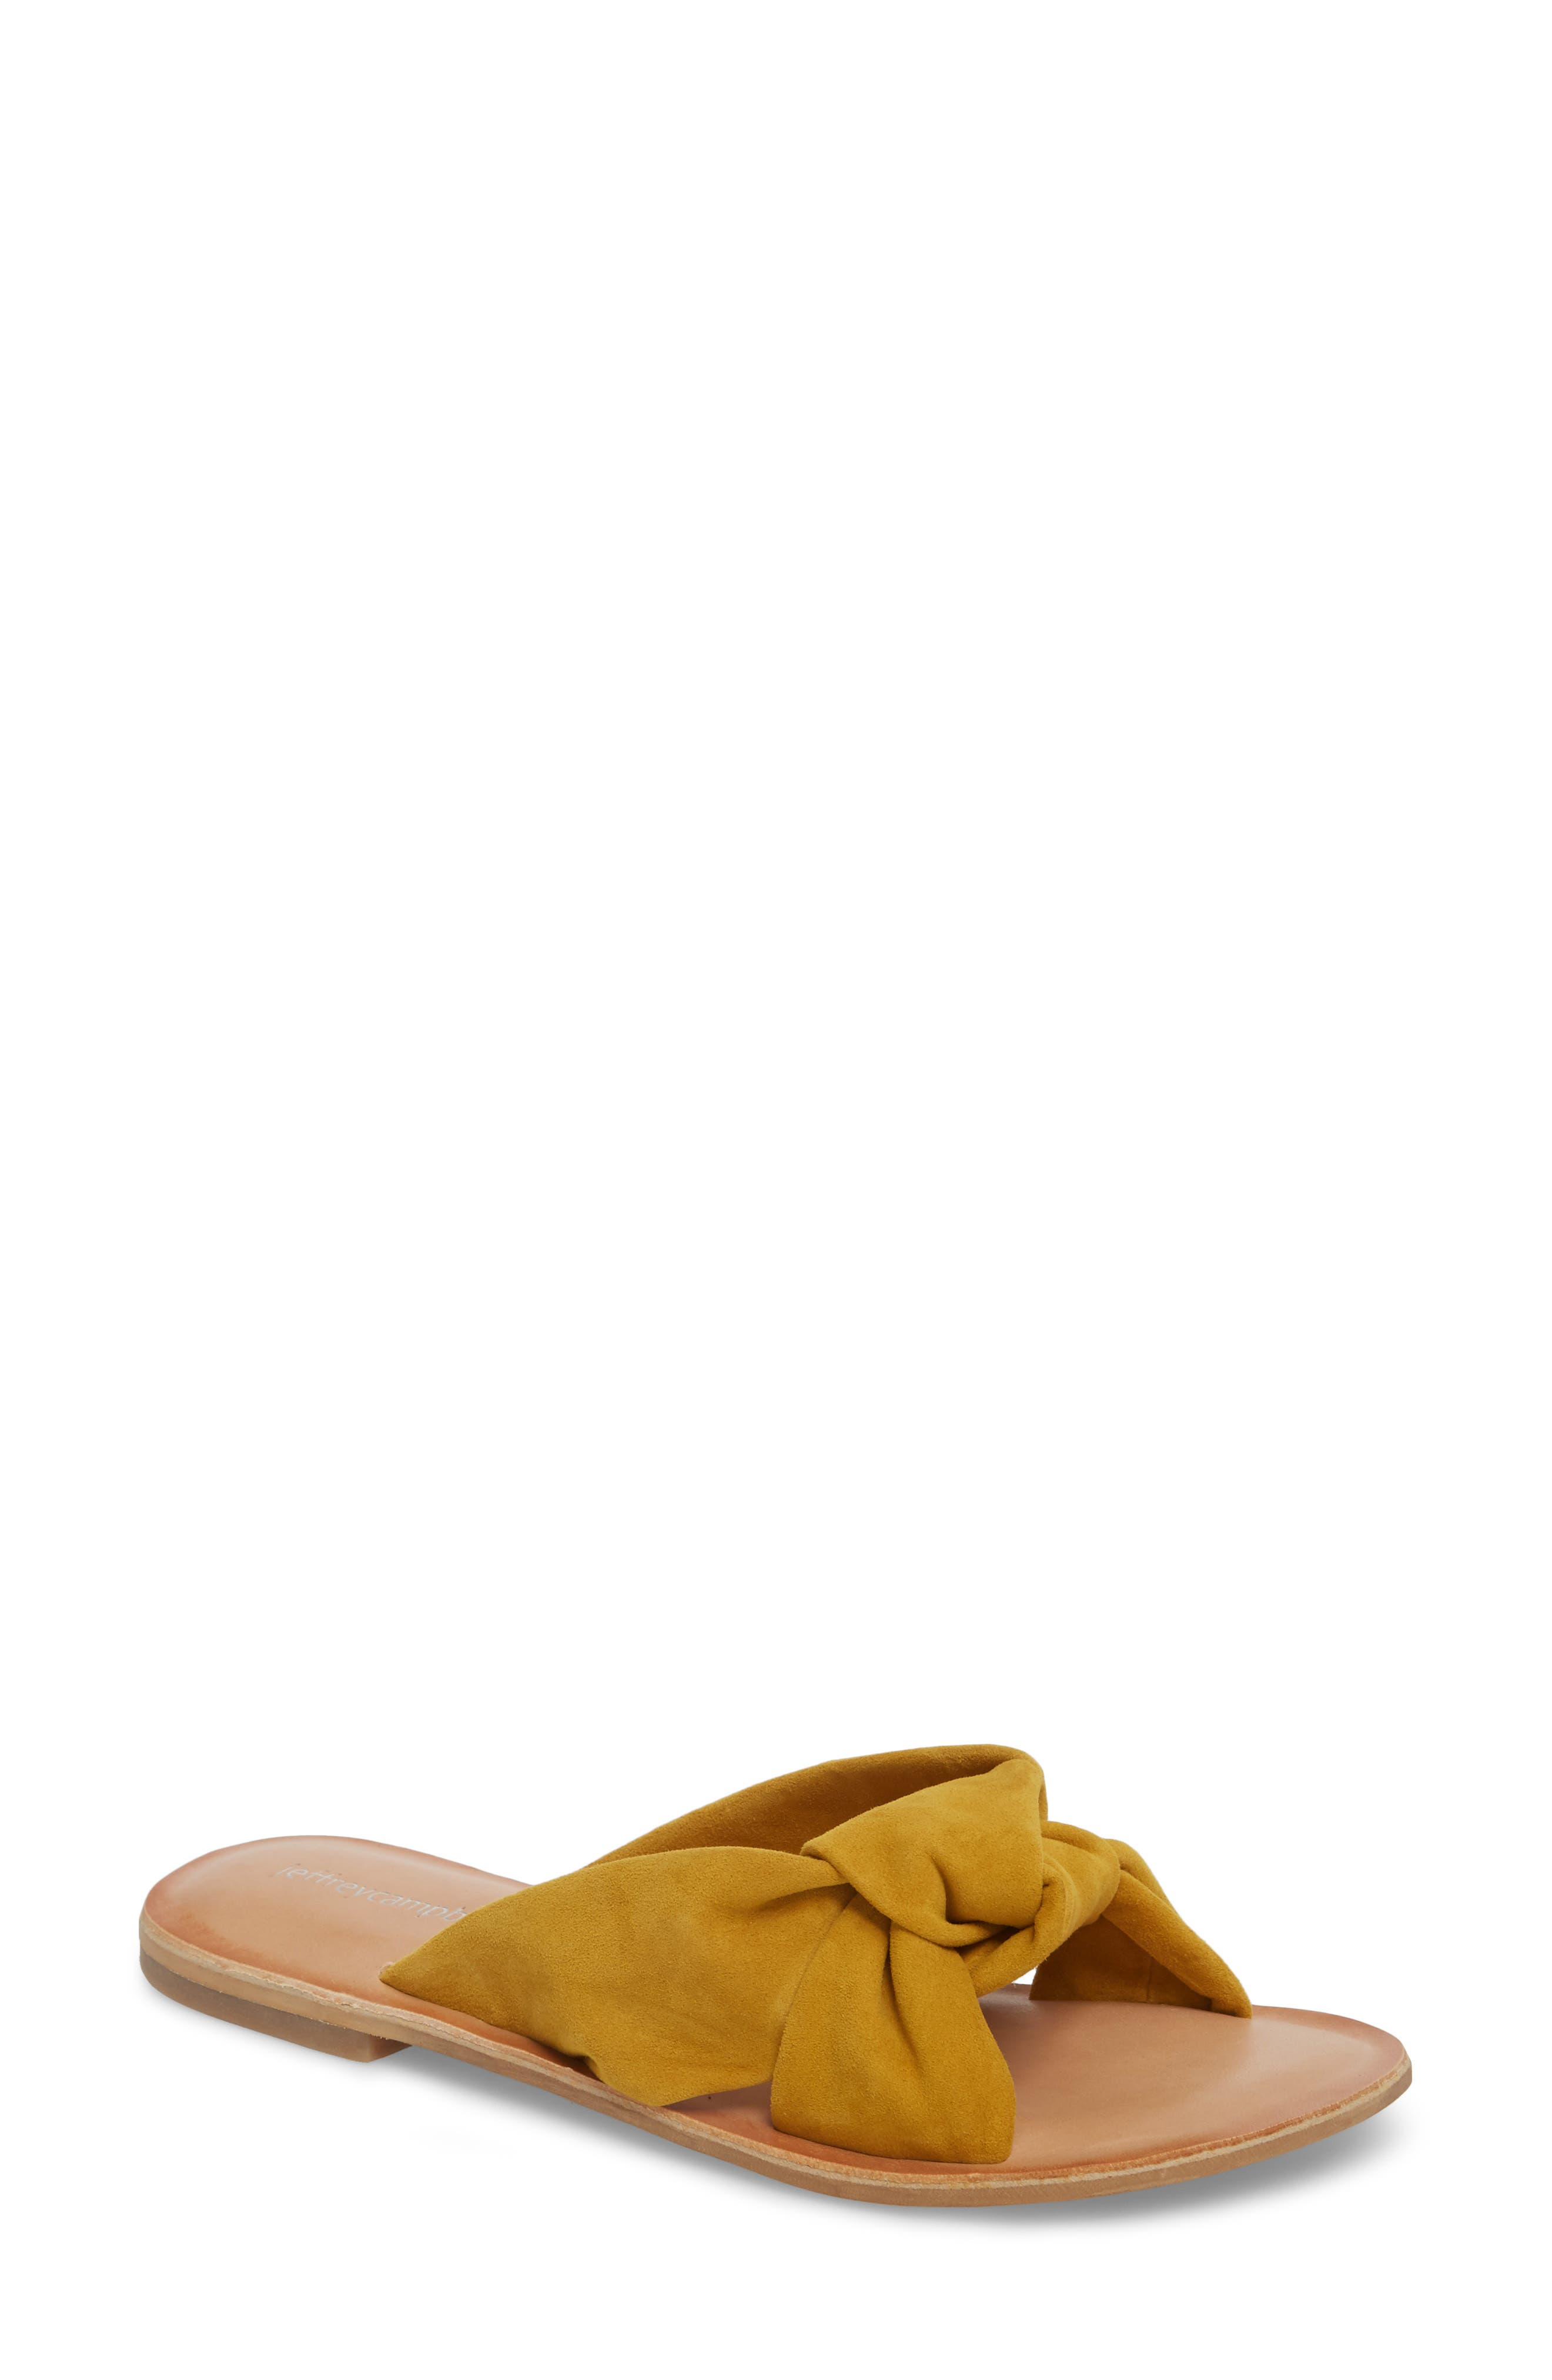 Zocalo Slide Sandal,                         Main,                         color, Mustard Suede